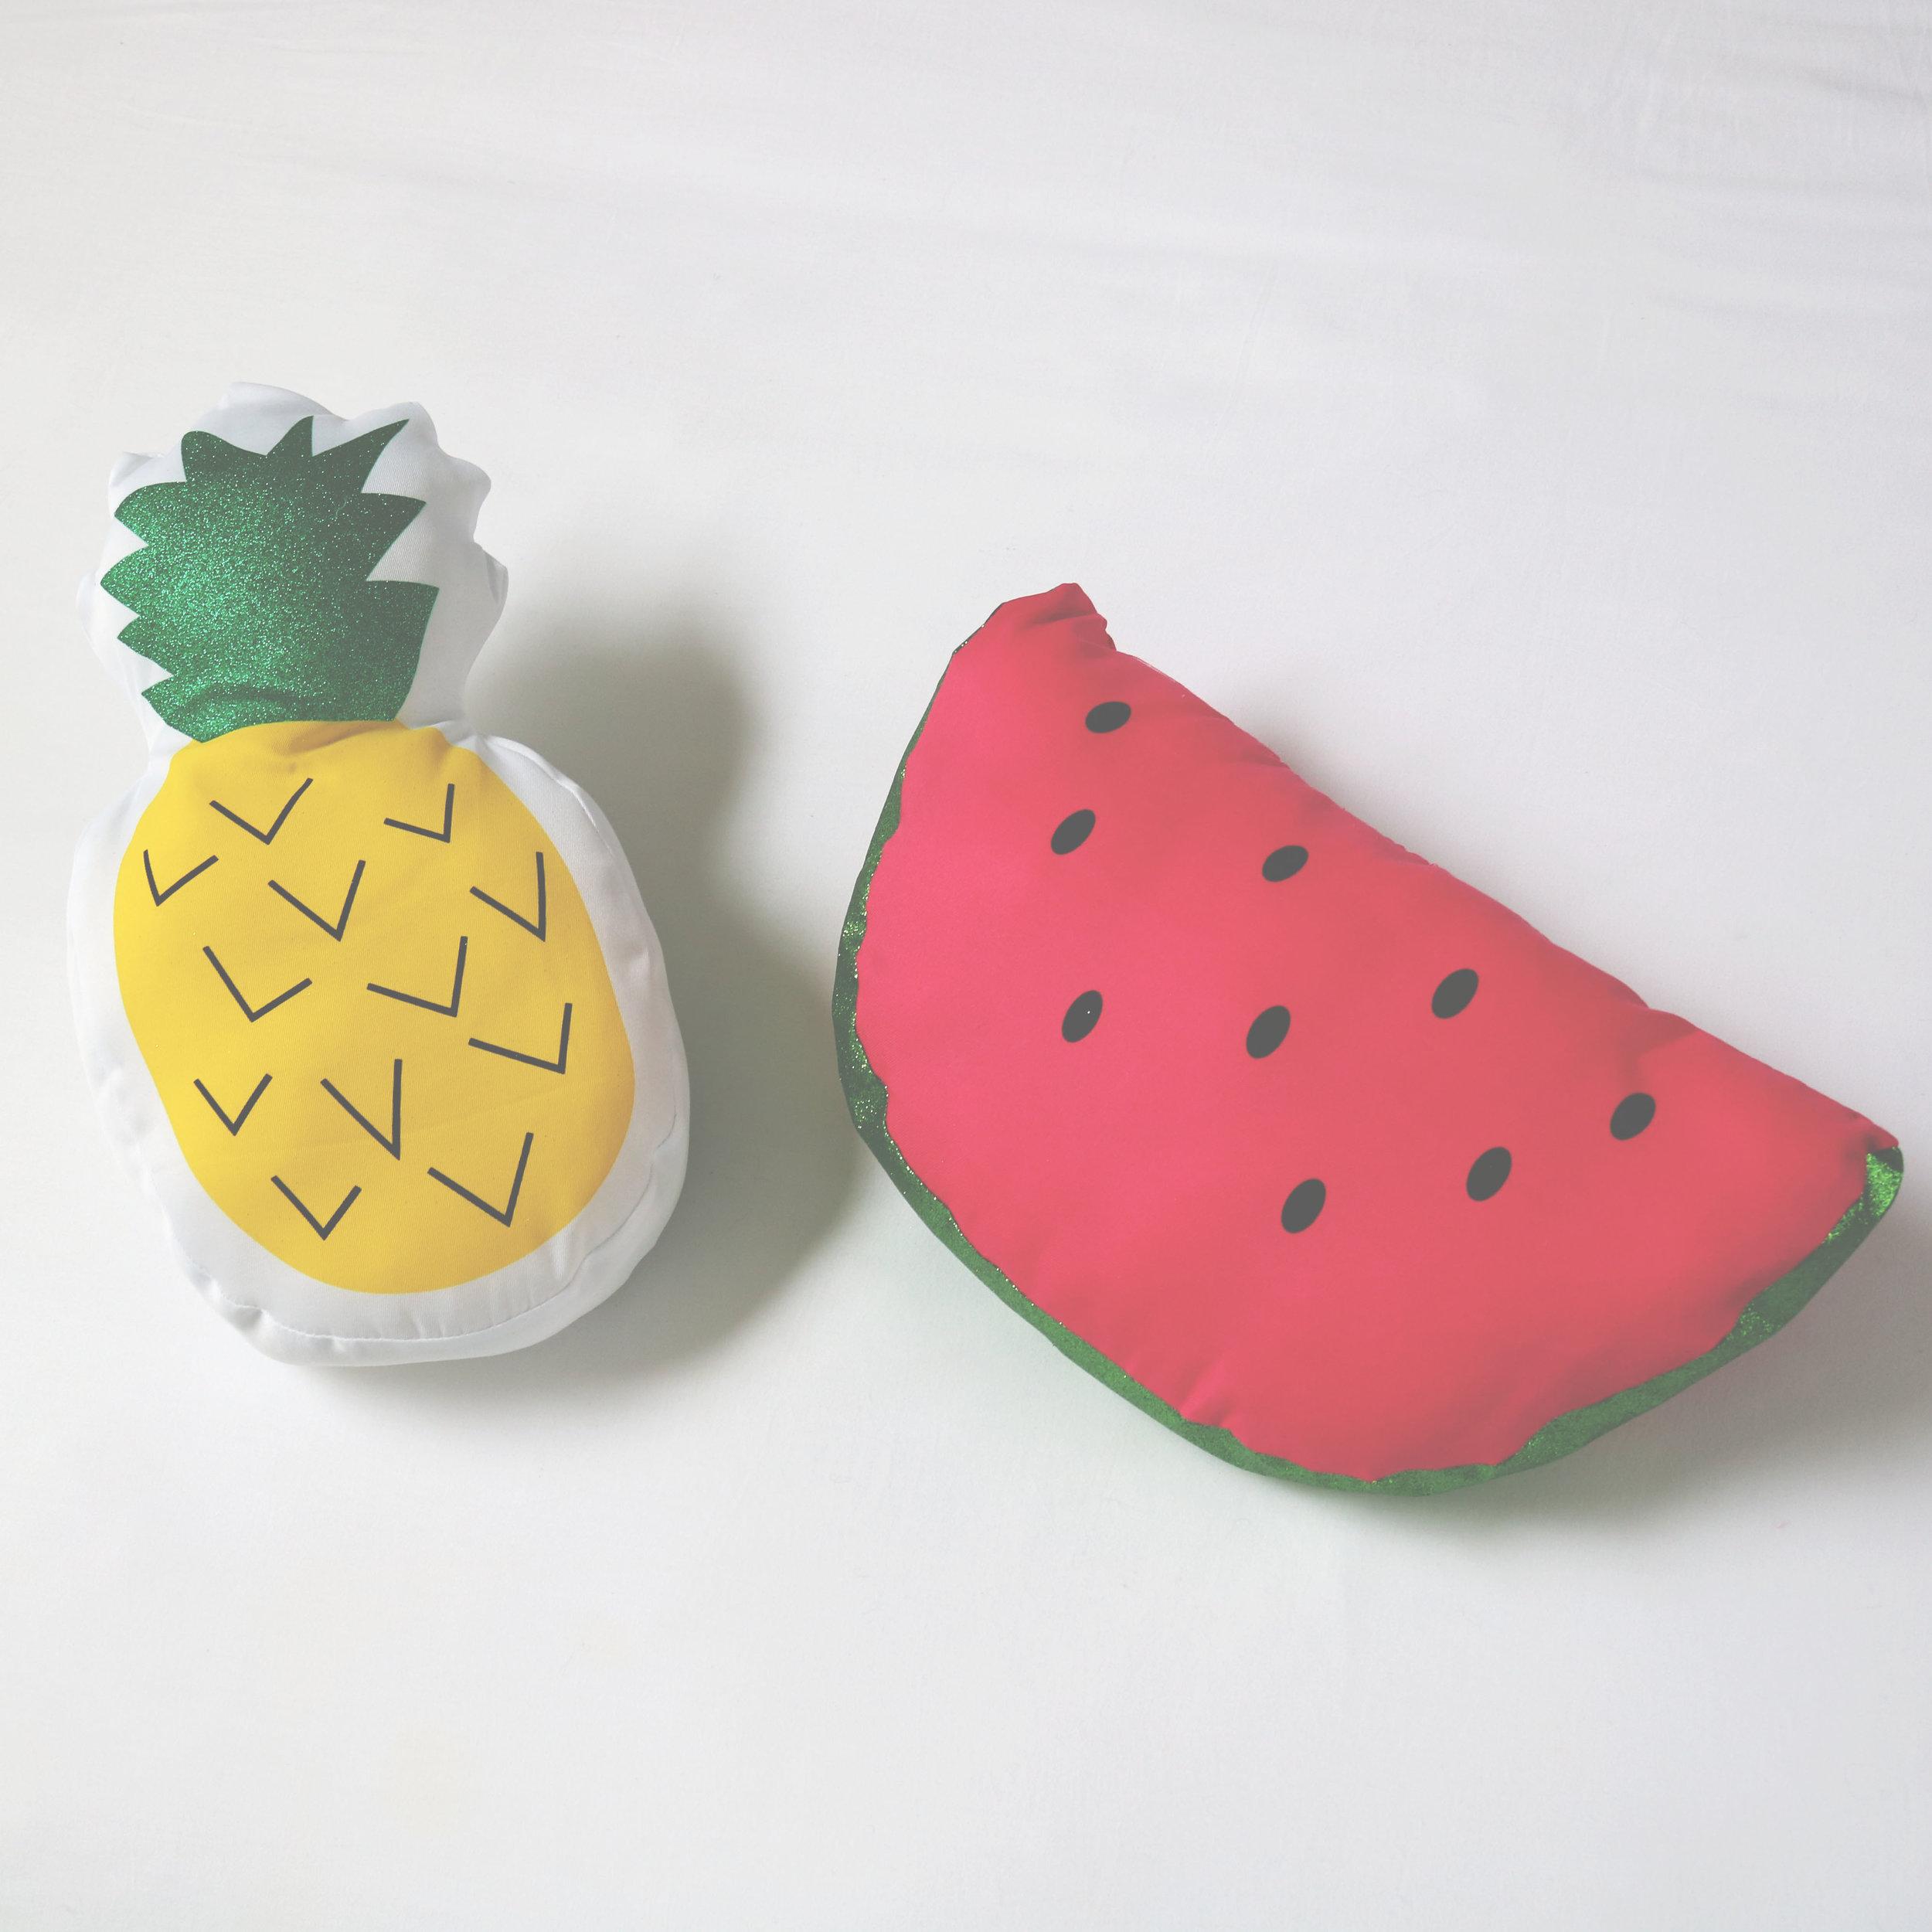 Prop_PineappleWatermelon.jpg